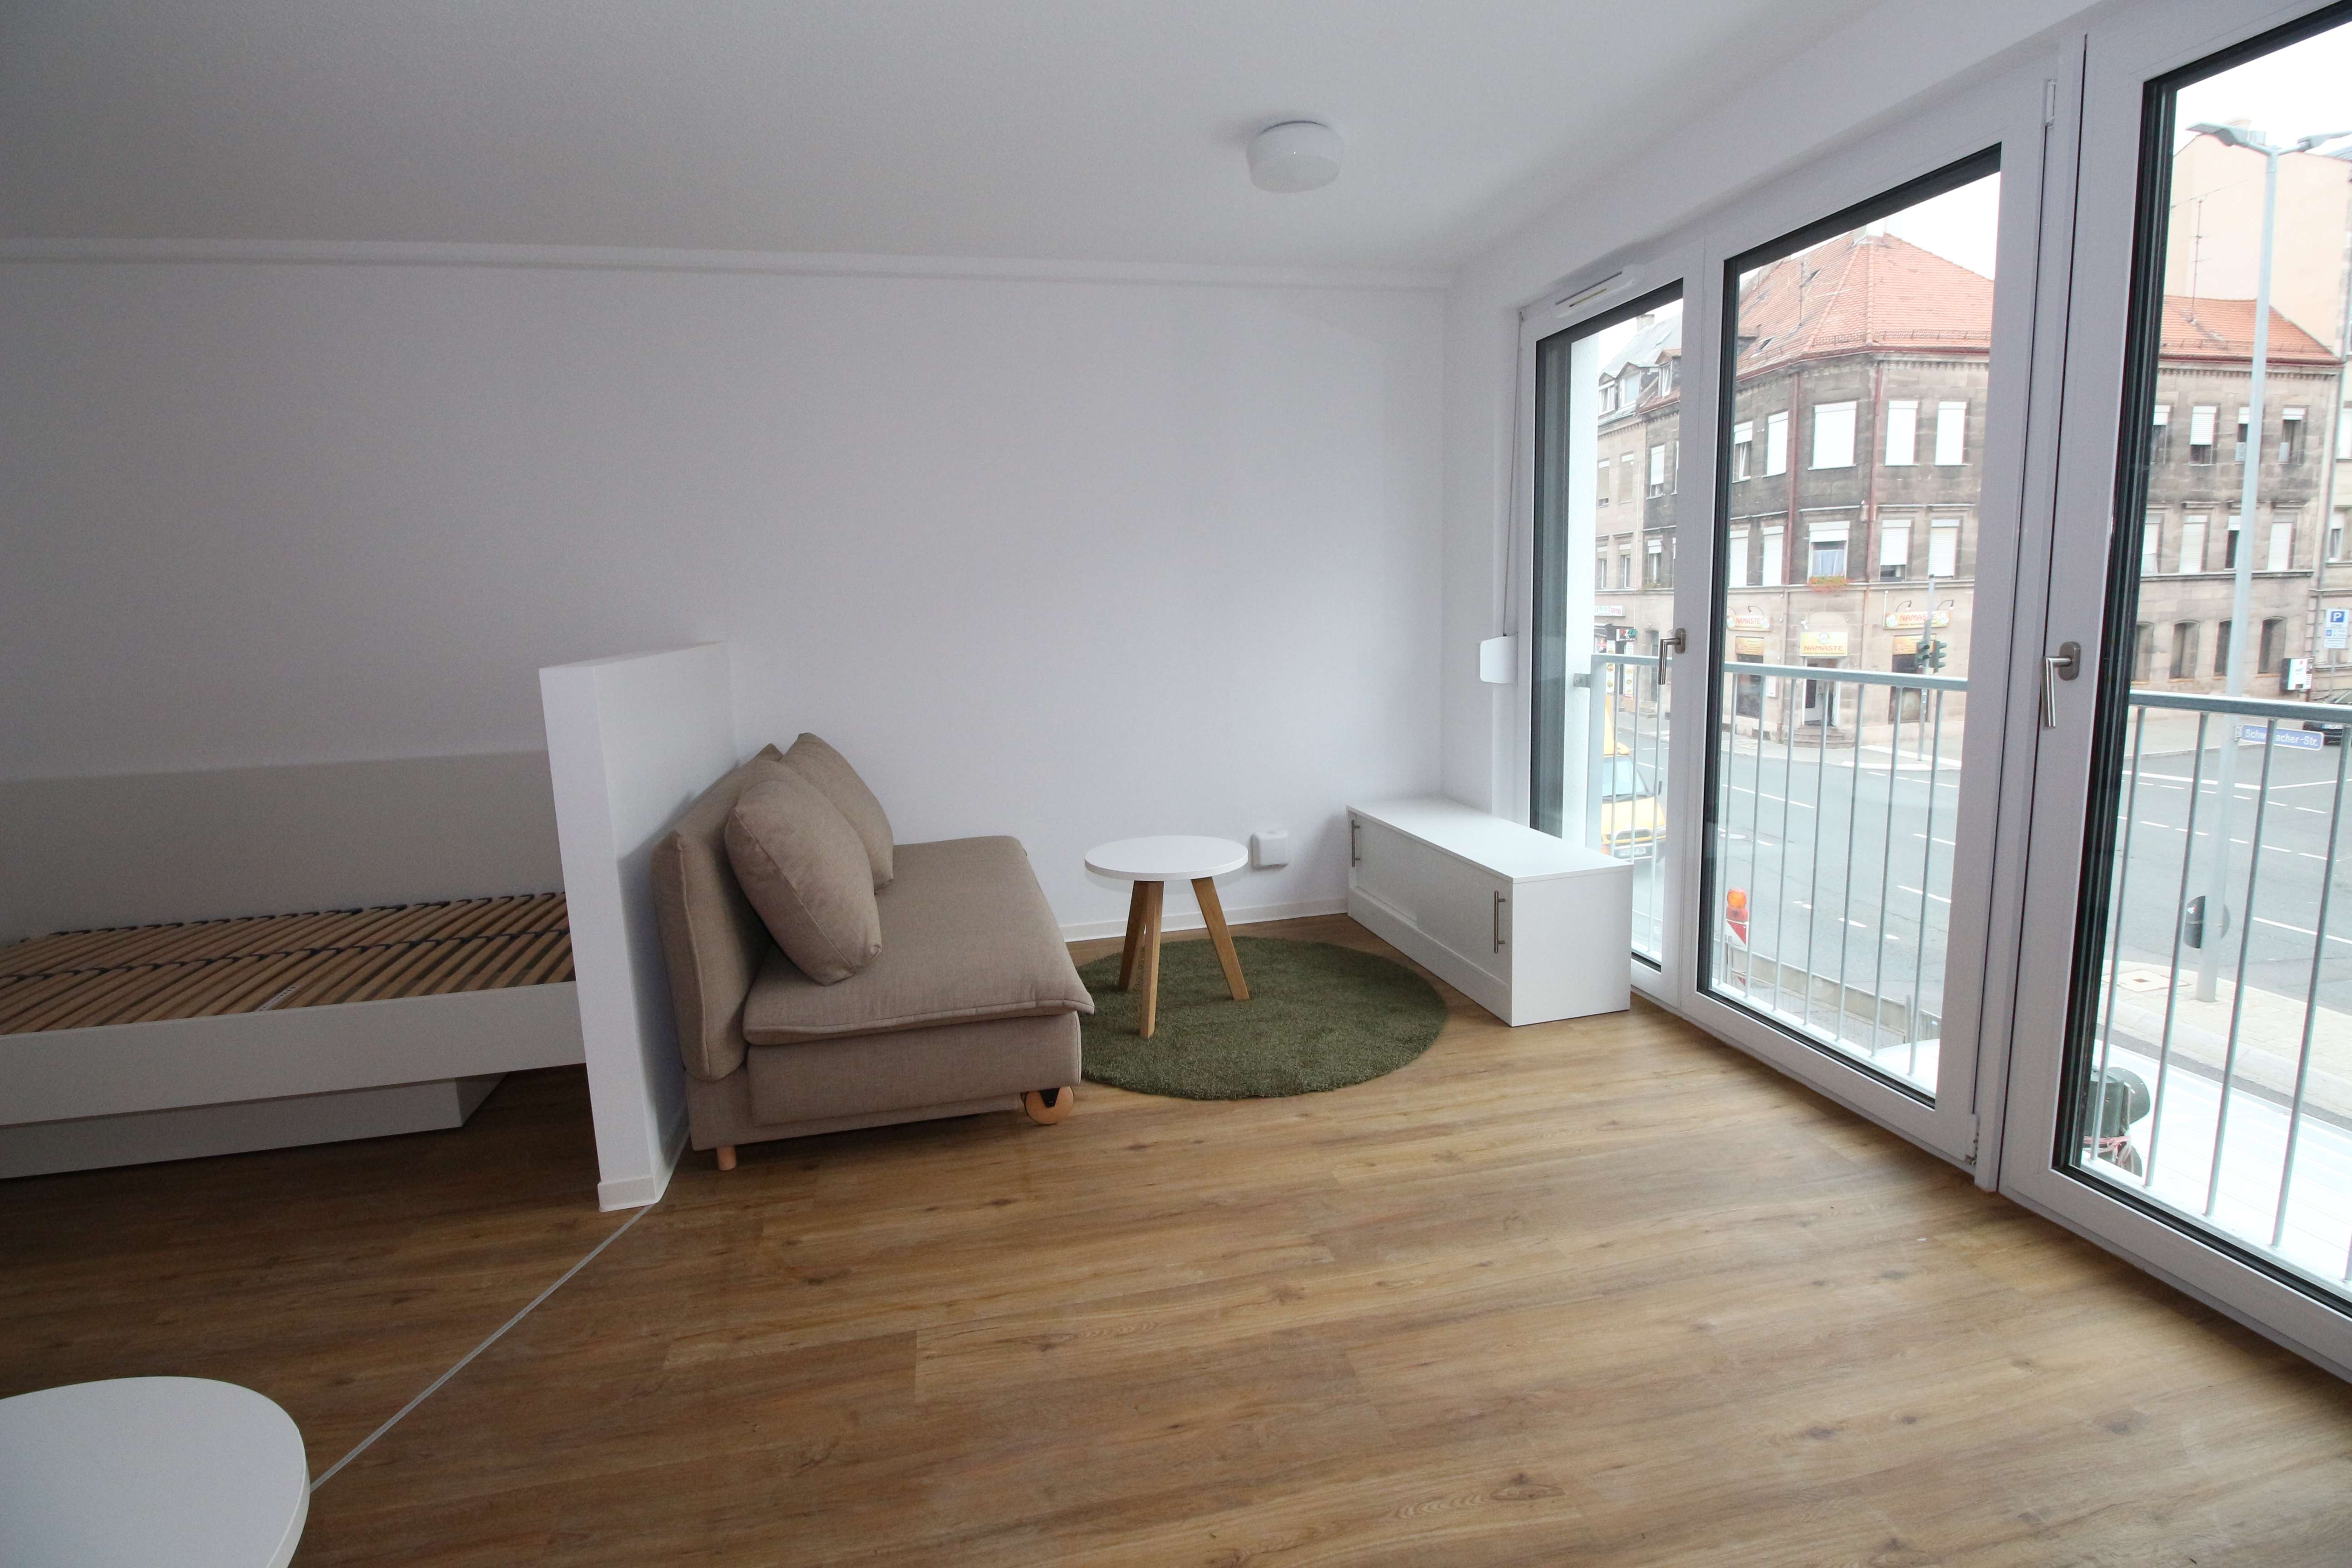 Schickes, voll möbliertes Mikro-Apartment in zentraler Südstadt-Lage in Altstadt, Innenstadt (Fürth)